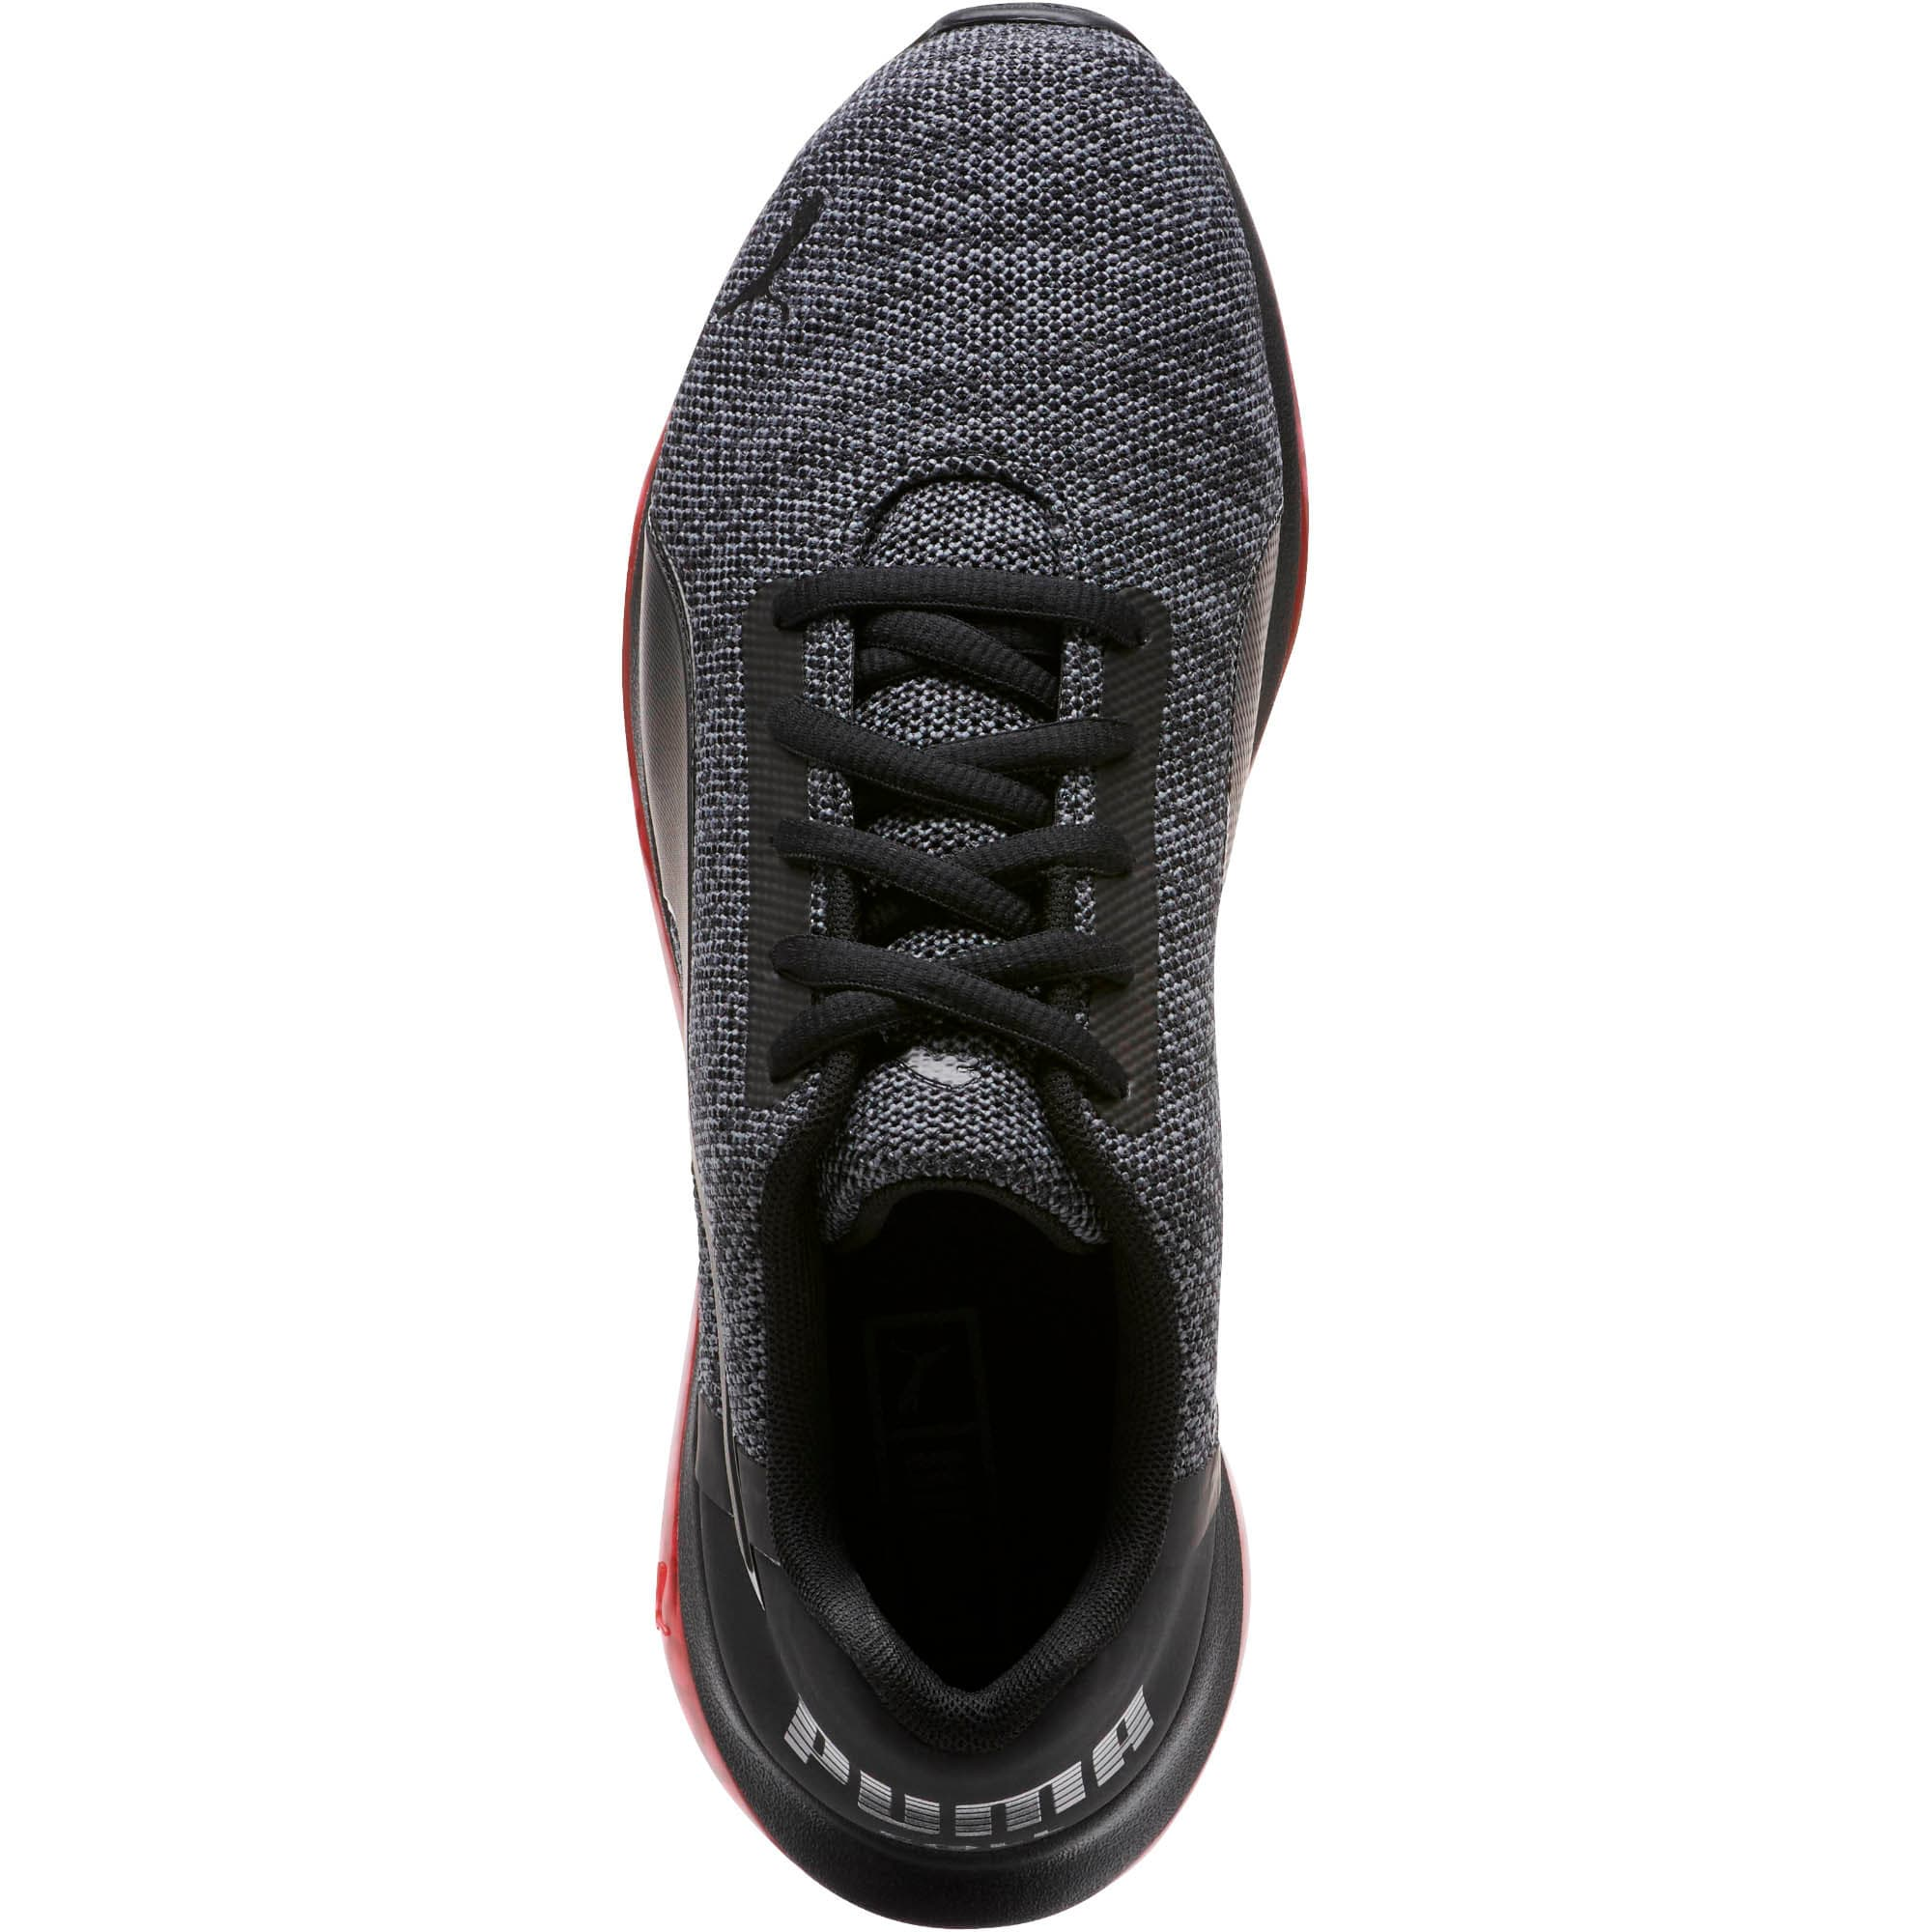 Thumbnail 6 of CELL Ultimate Knit Men's Training Shoes, Pma Blk-QUIET SHDE-Rbbon Red, medium